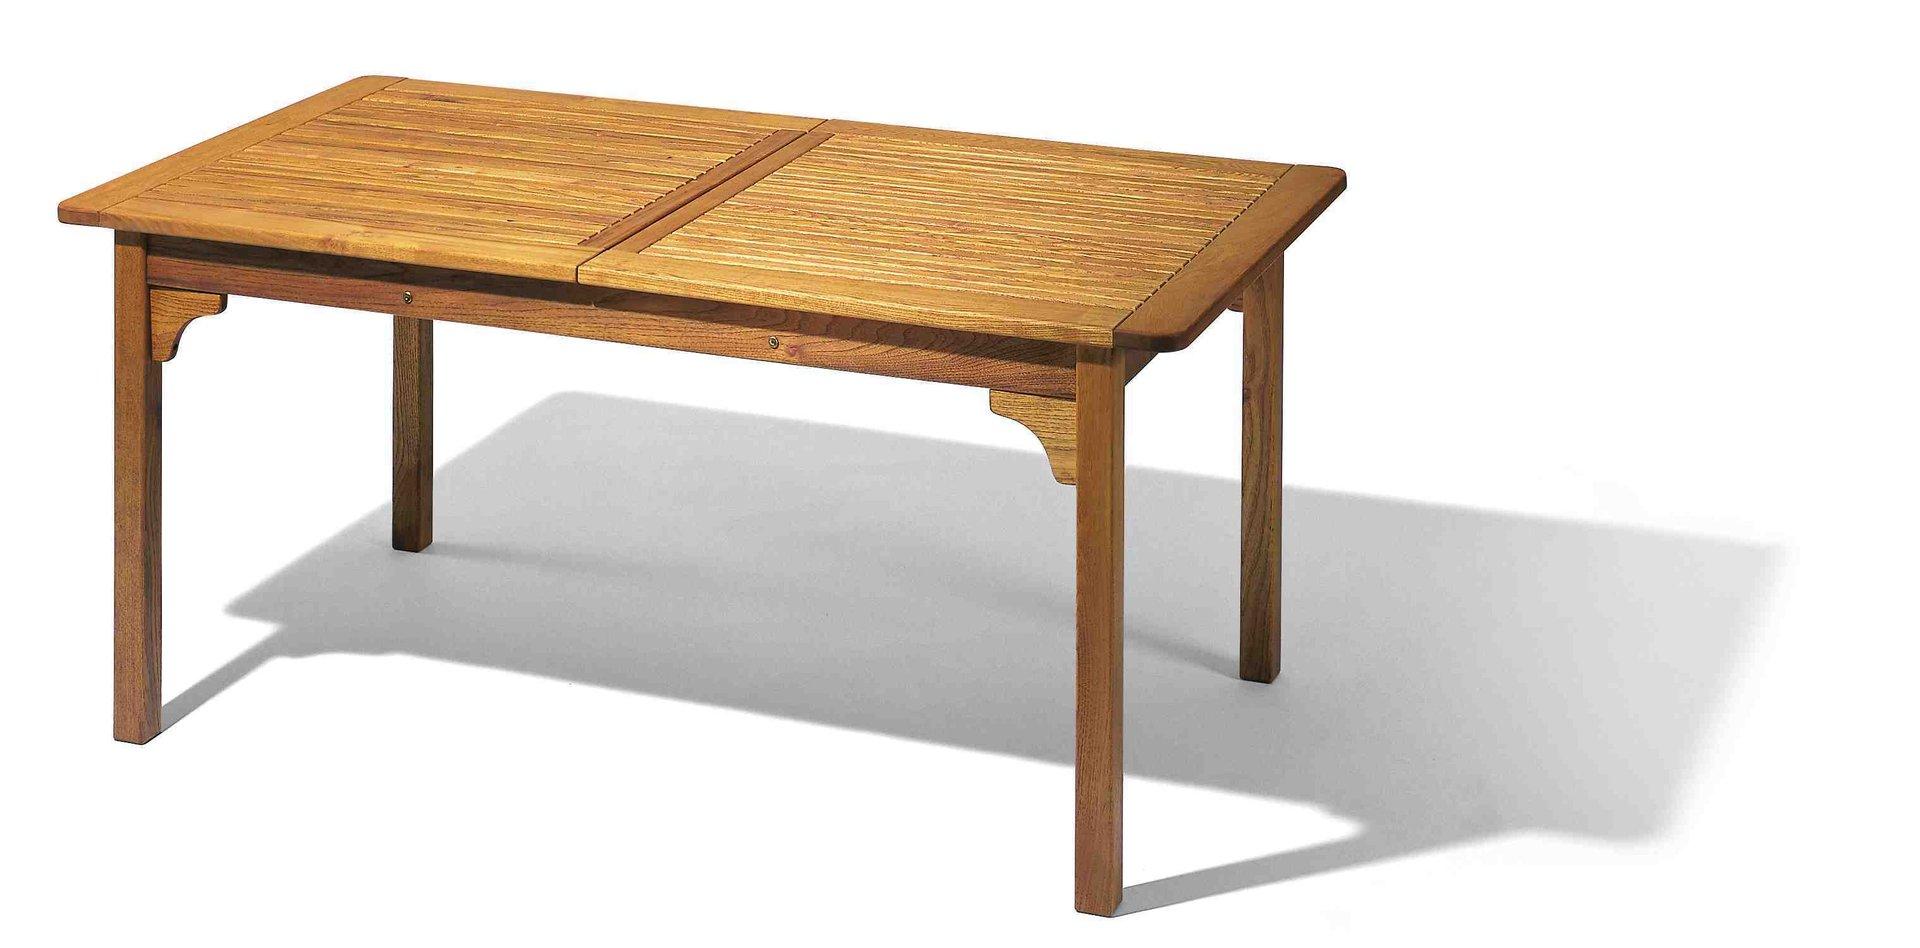 lifetime tisch 170 220 x 90 cm ausziehbar bela bauelemente gartenm bel. Black Bedroom Furniture Sets. Home Design Ideas